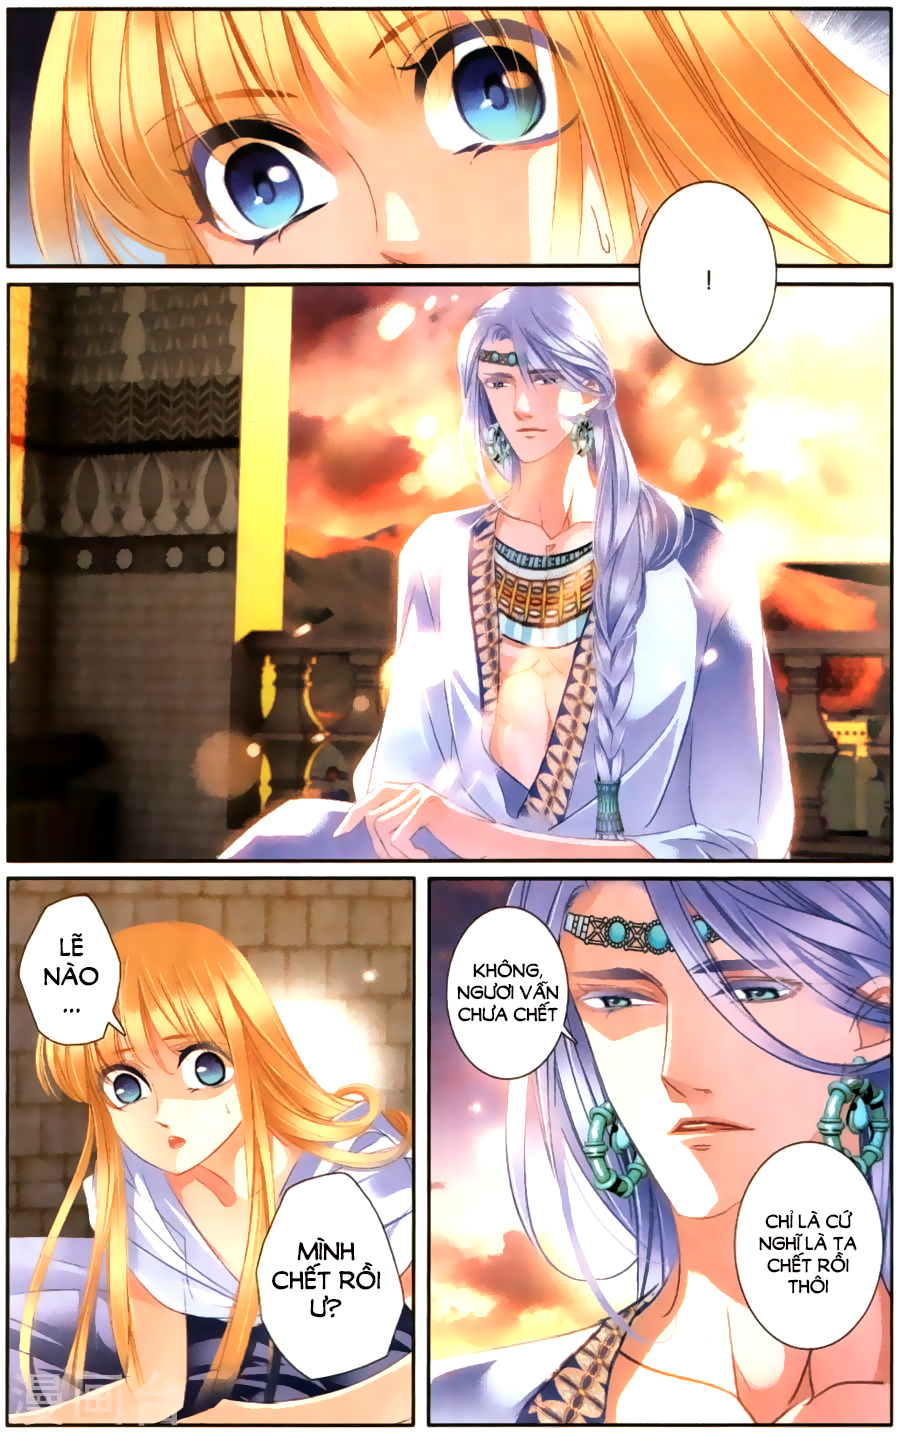 Sủng Phi Của Pharaoh chap 61 - Trang 6